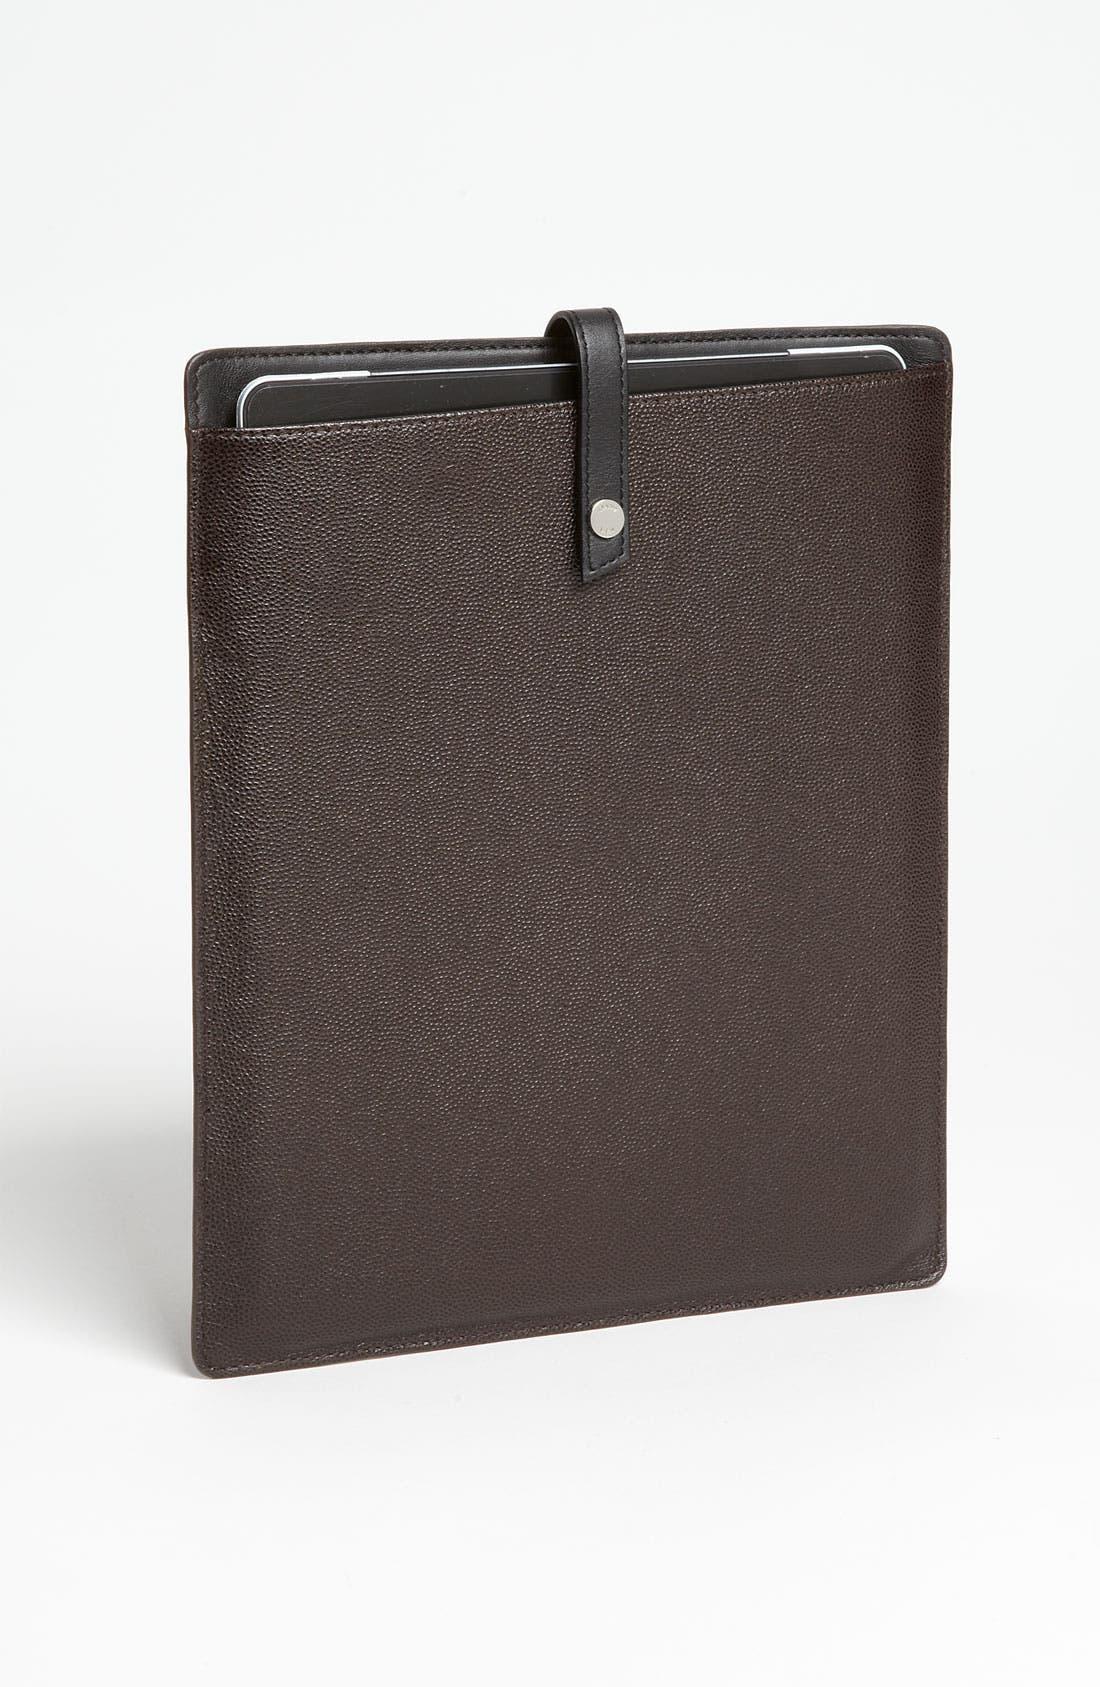 Main Image - WANT Les Essentiels de la Vie 'Capital' iPad 2 Leather Sleeve